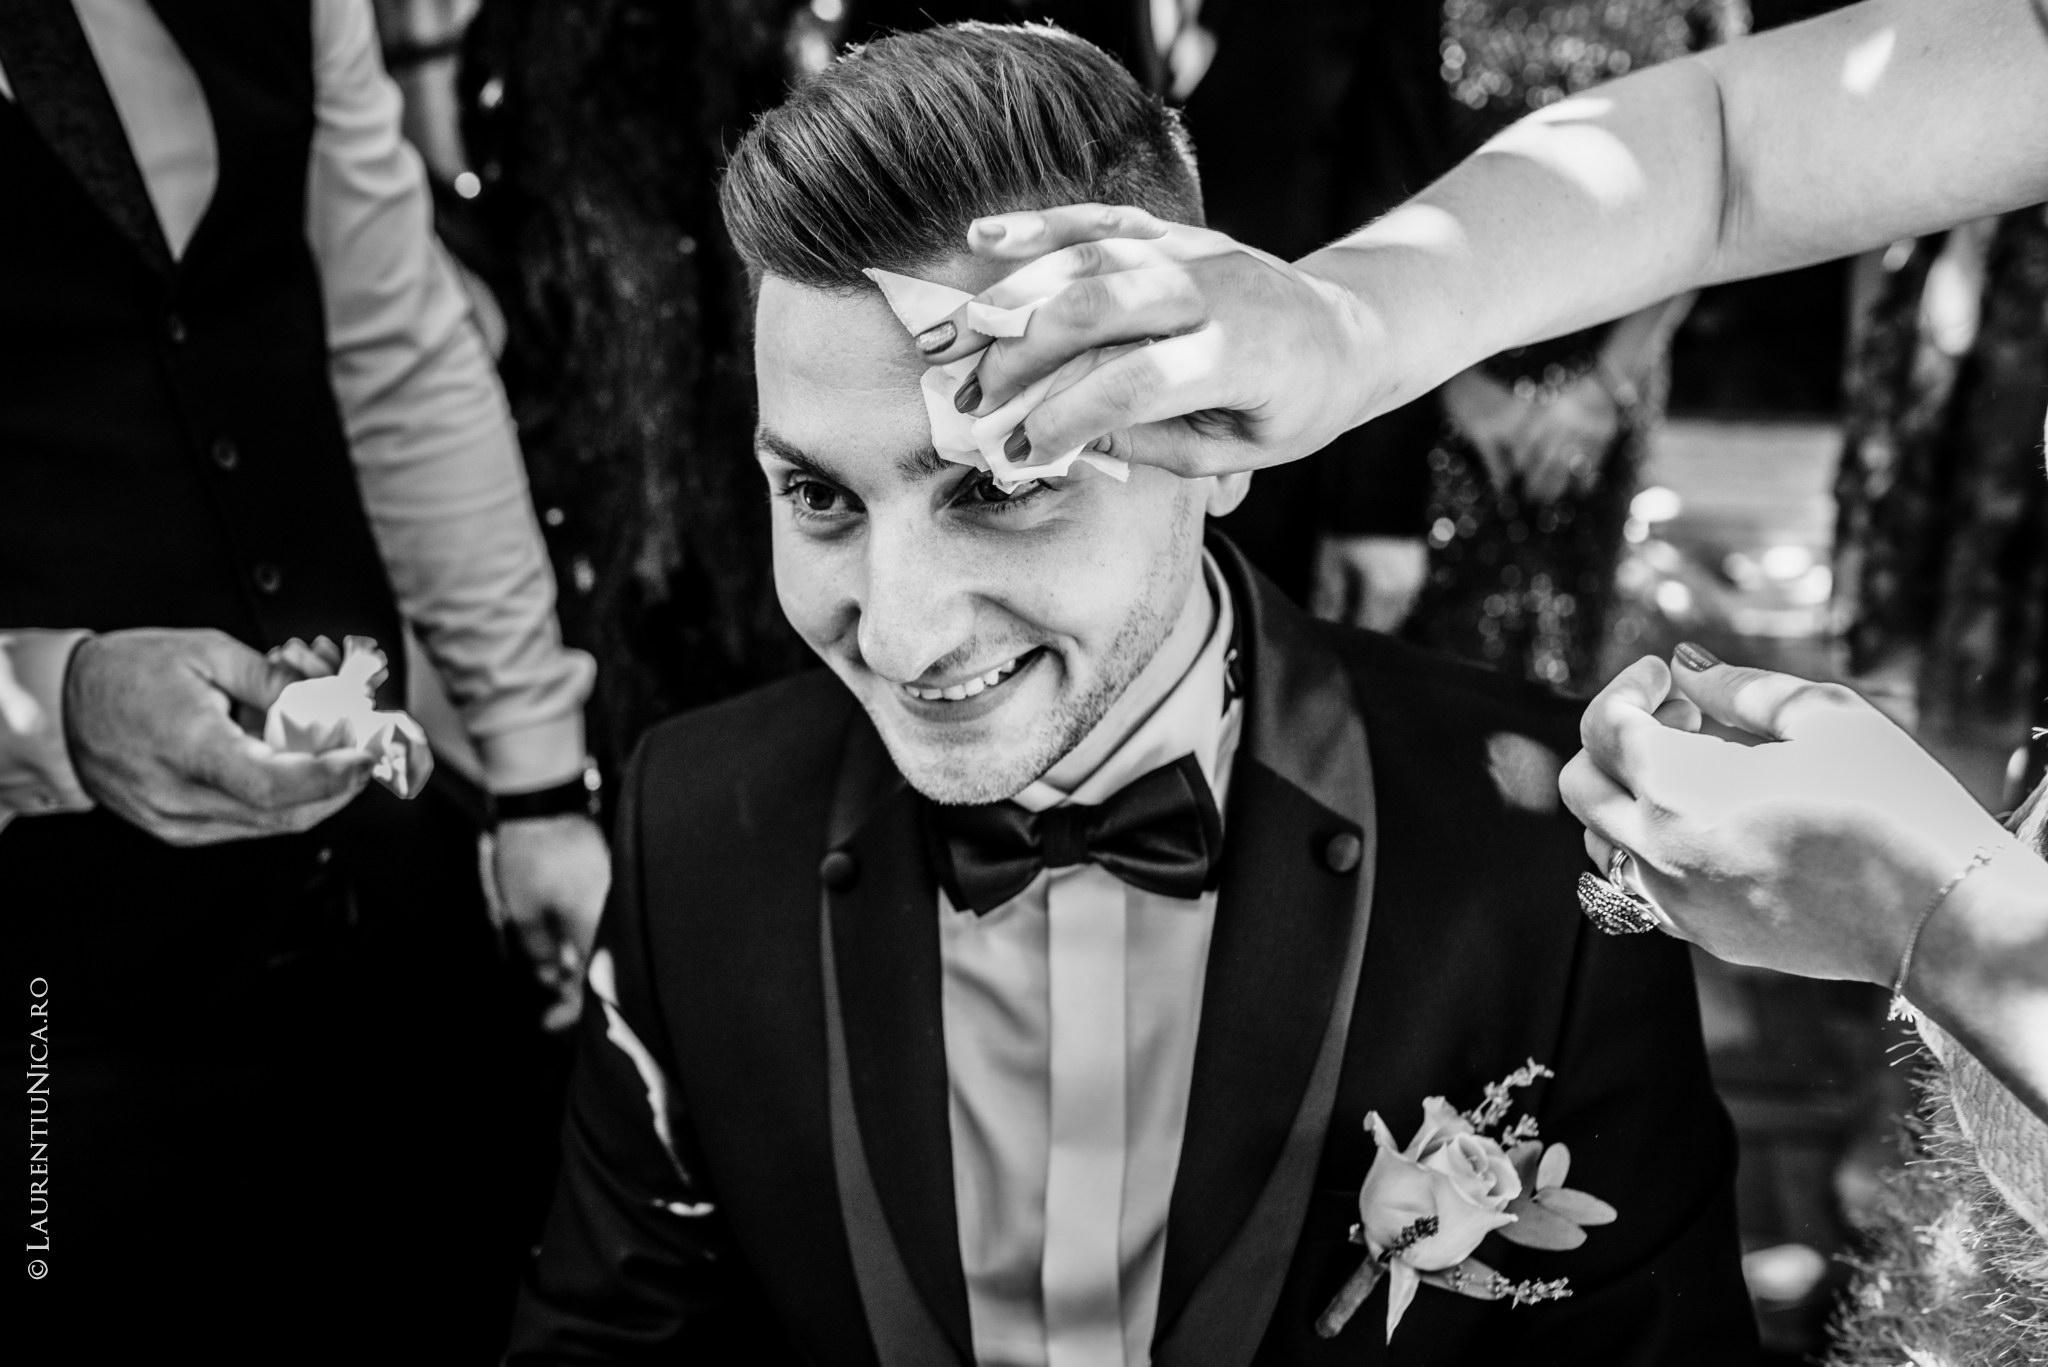 fotografii nunta craiova bia alex fotograf nunta laurentiu nica 19 - Bia & Alex | Fotografii nunta | Craiova